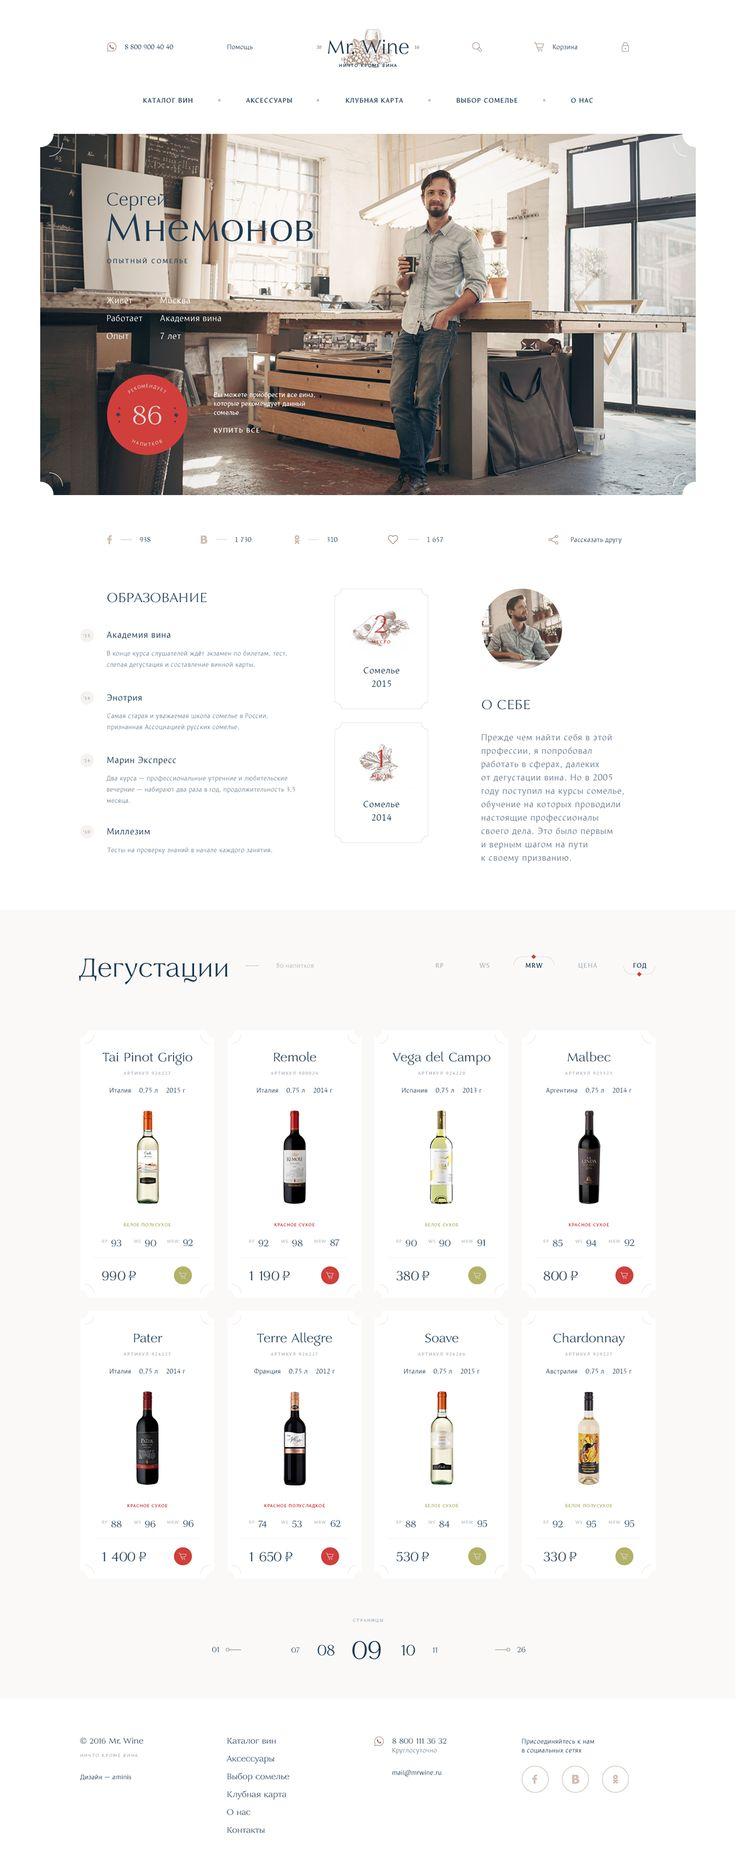 Mr. Wine on Behance